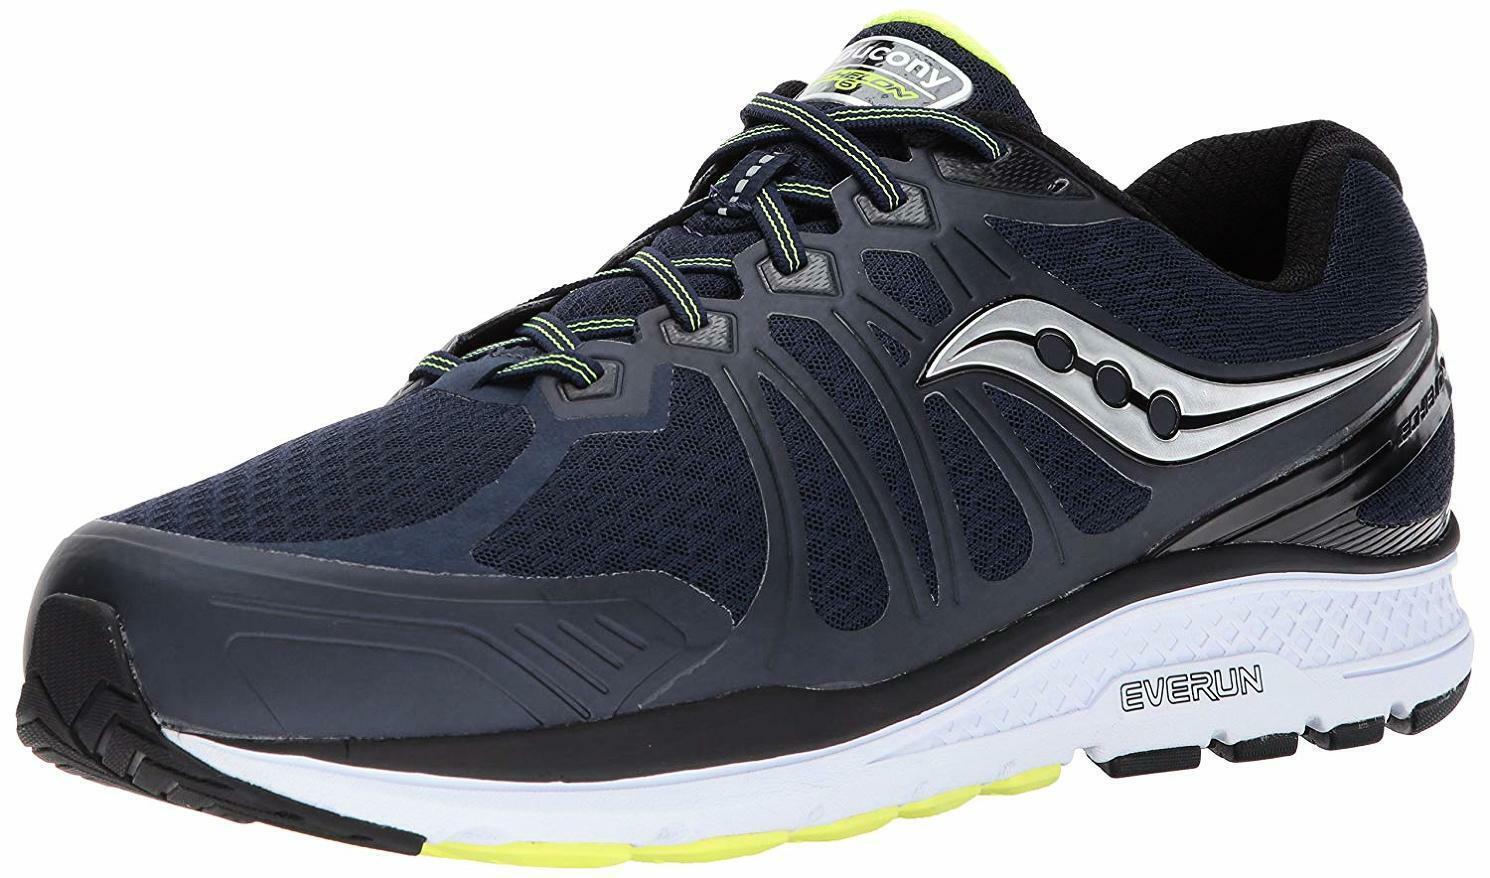 Saucony Men's Men's Men's Echelon 6 Running shoes - Choose SZ color bad9b4